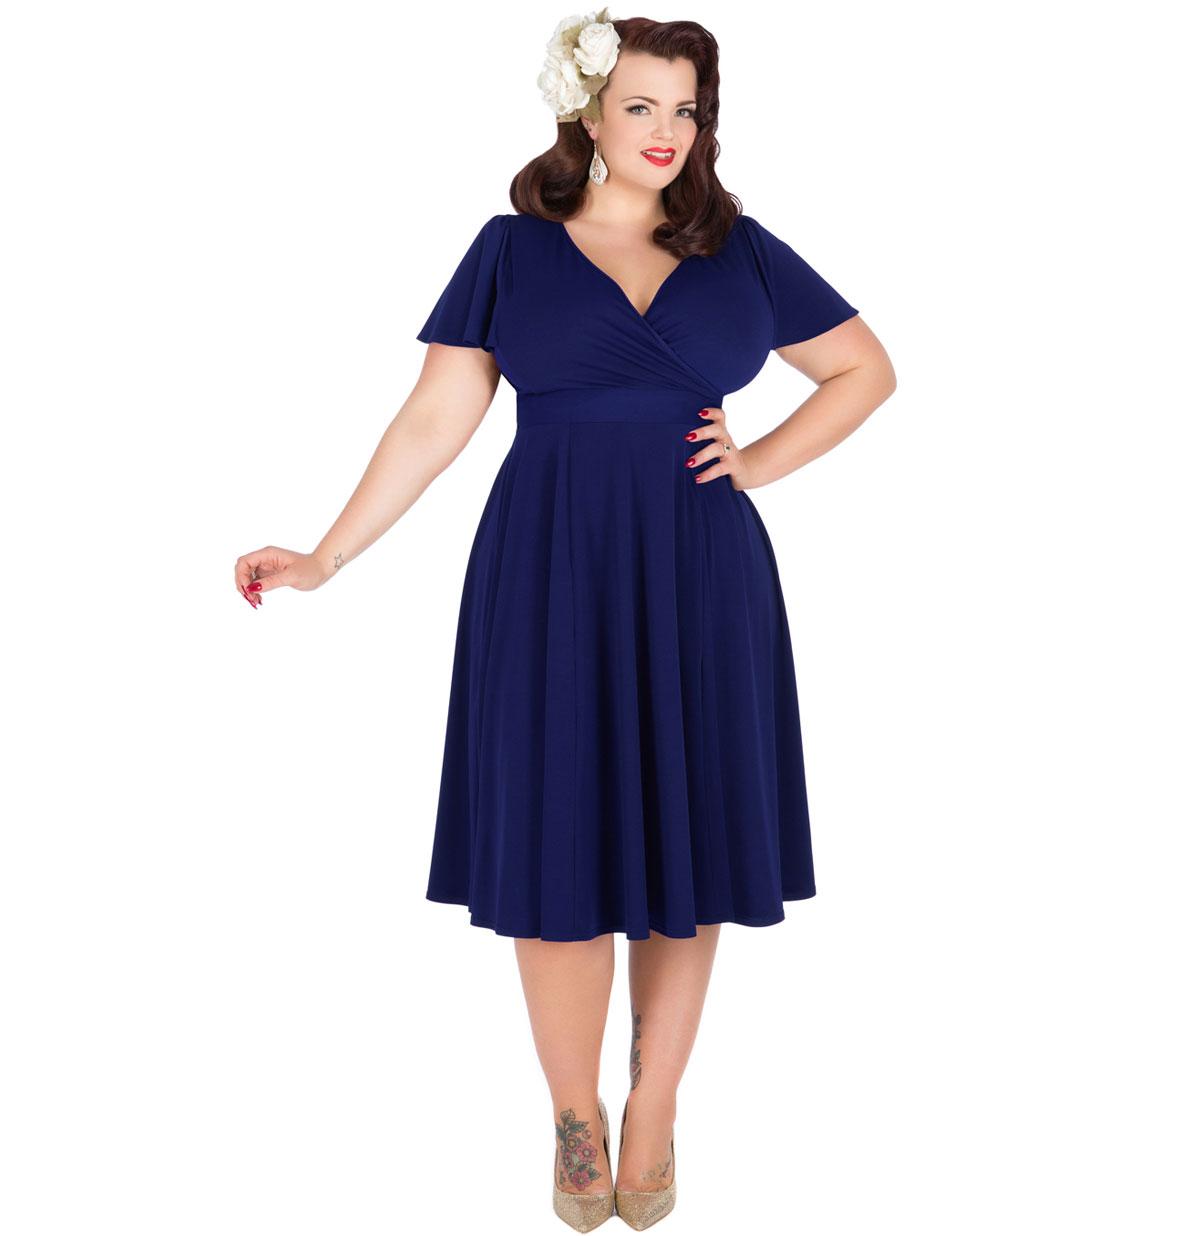 Lyra Dress Royal Blue - Plus Size Only